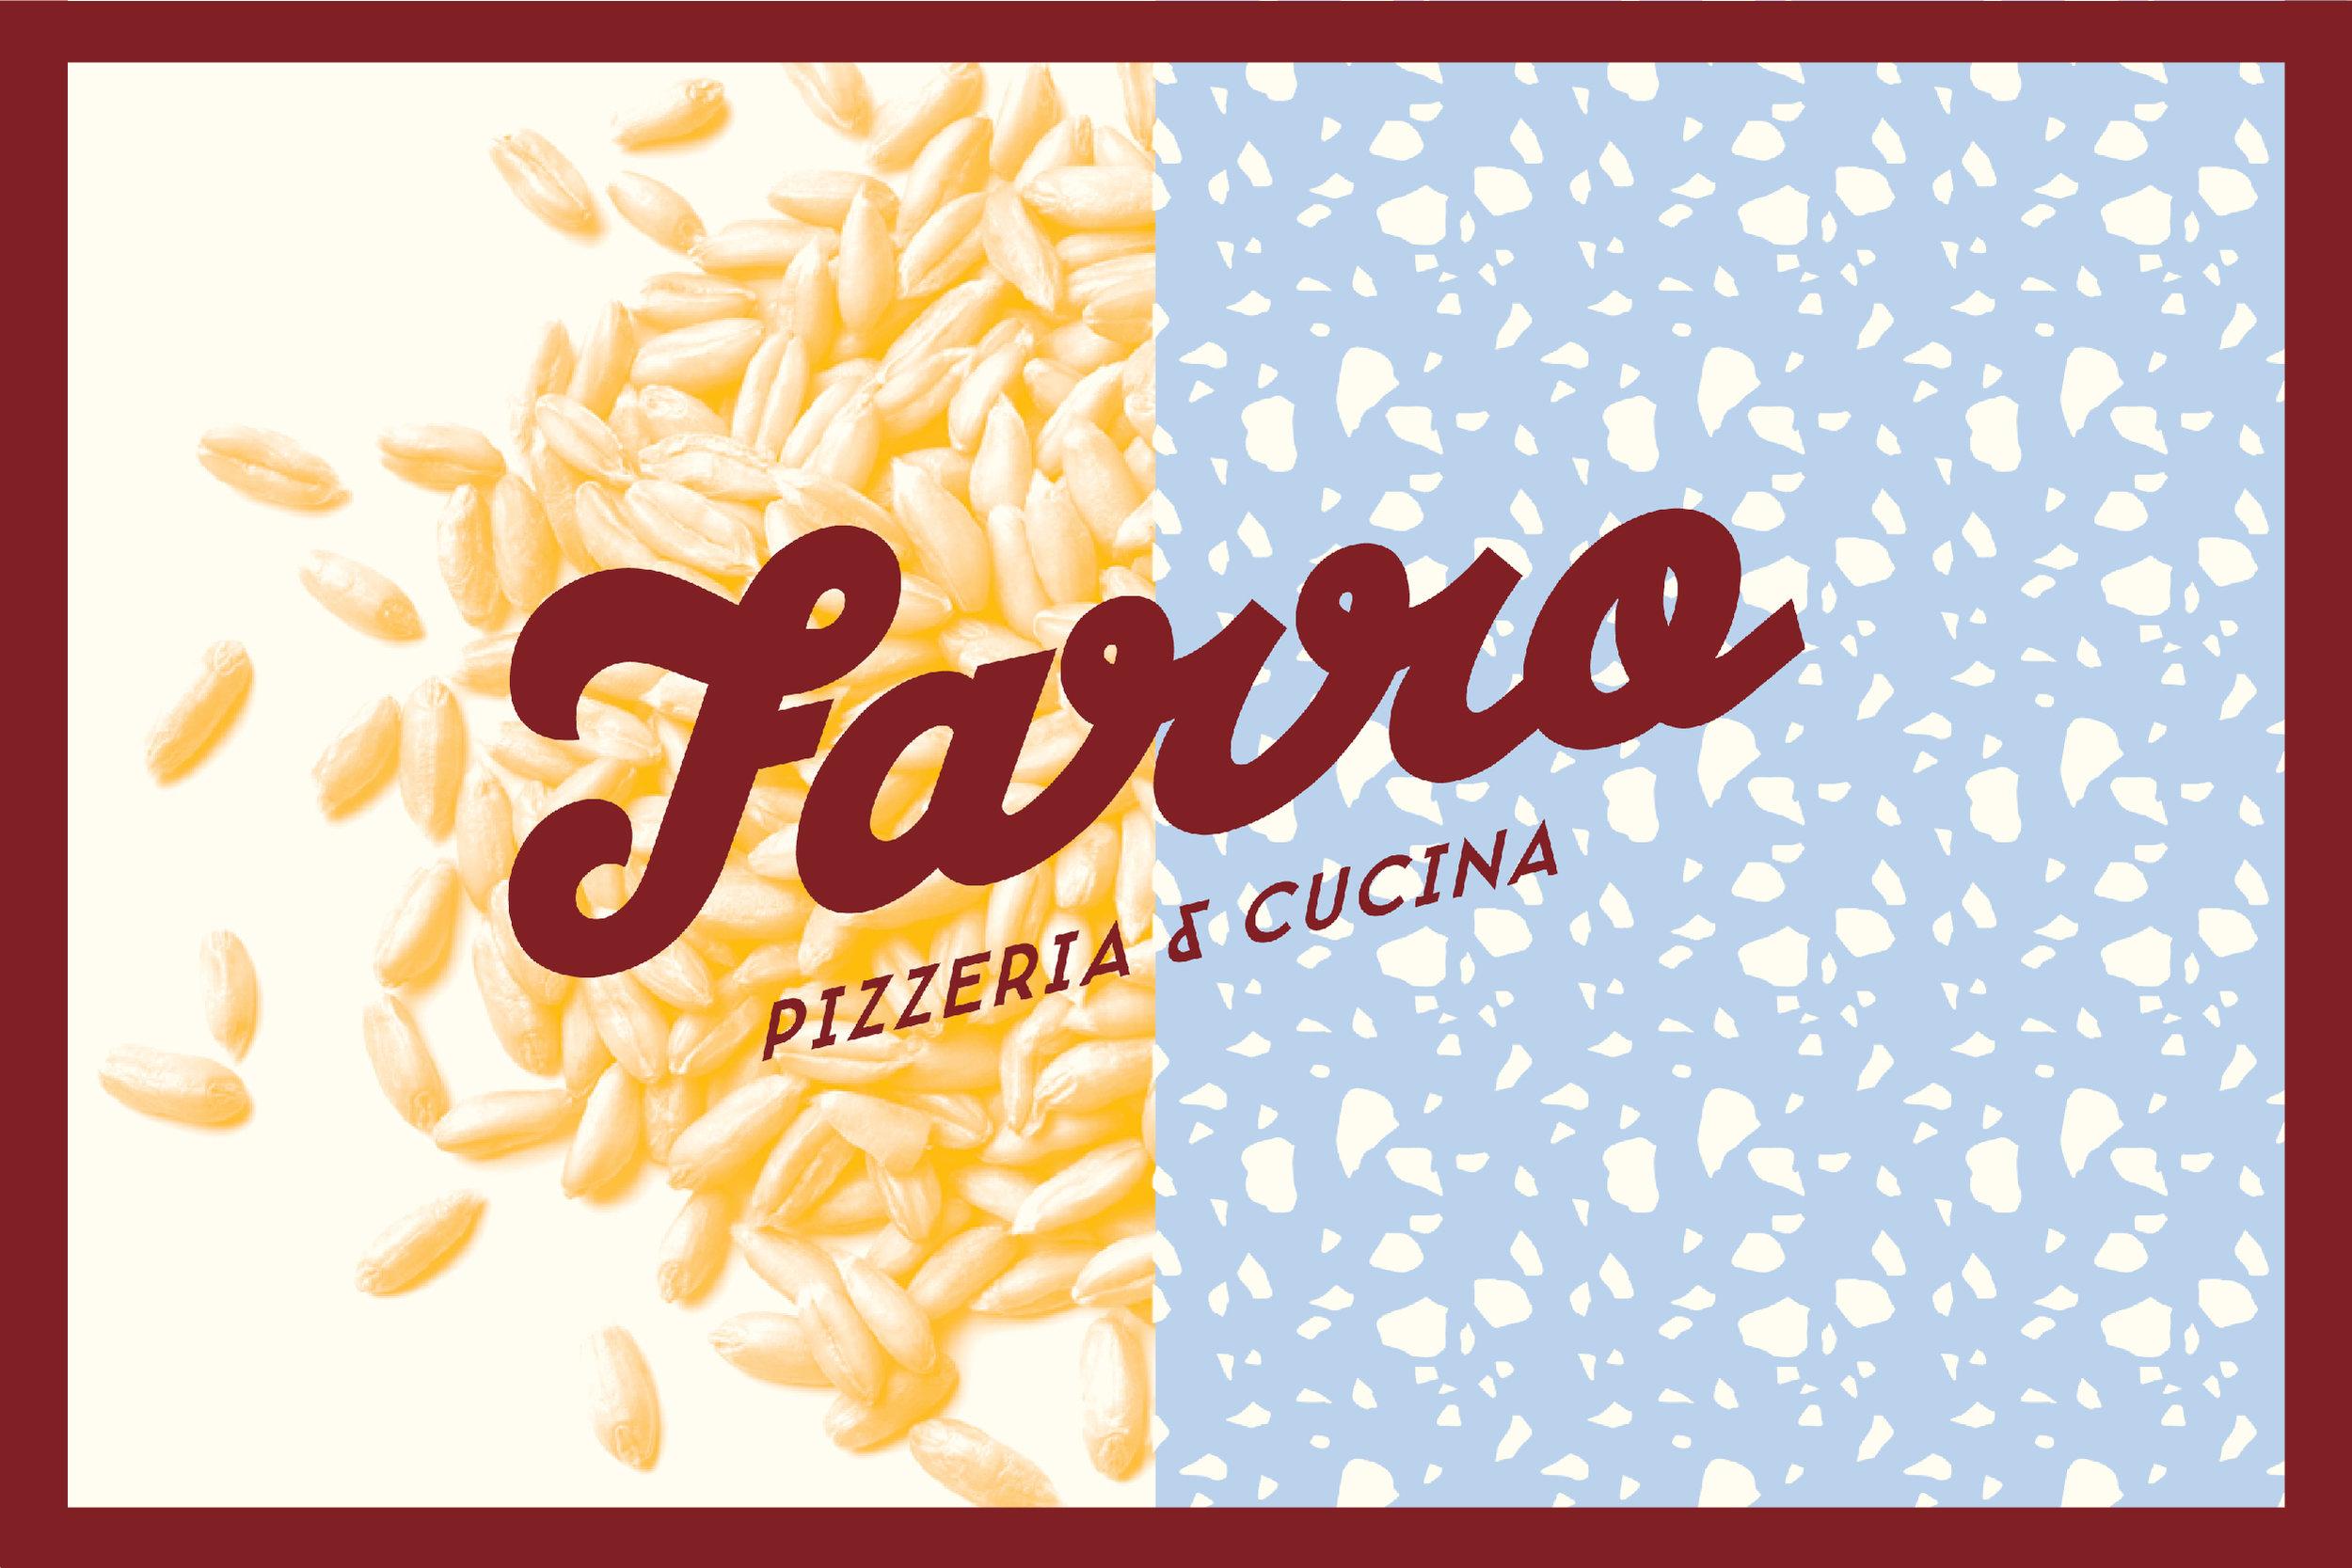 Farro-01.jpg